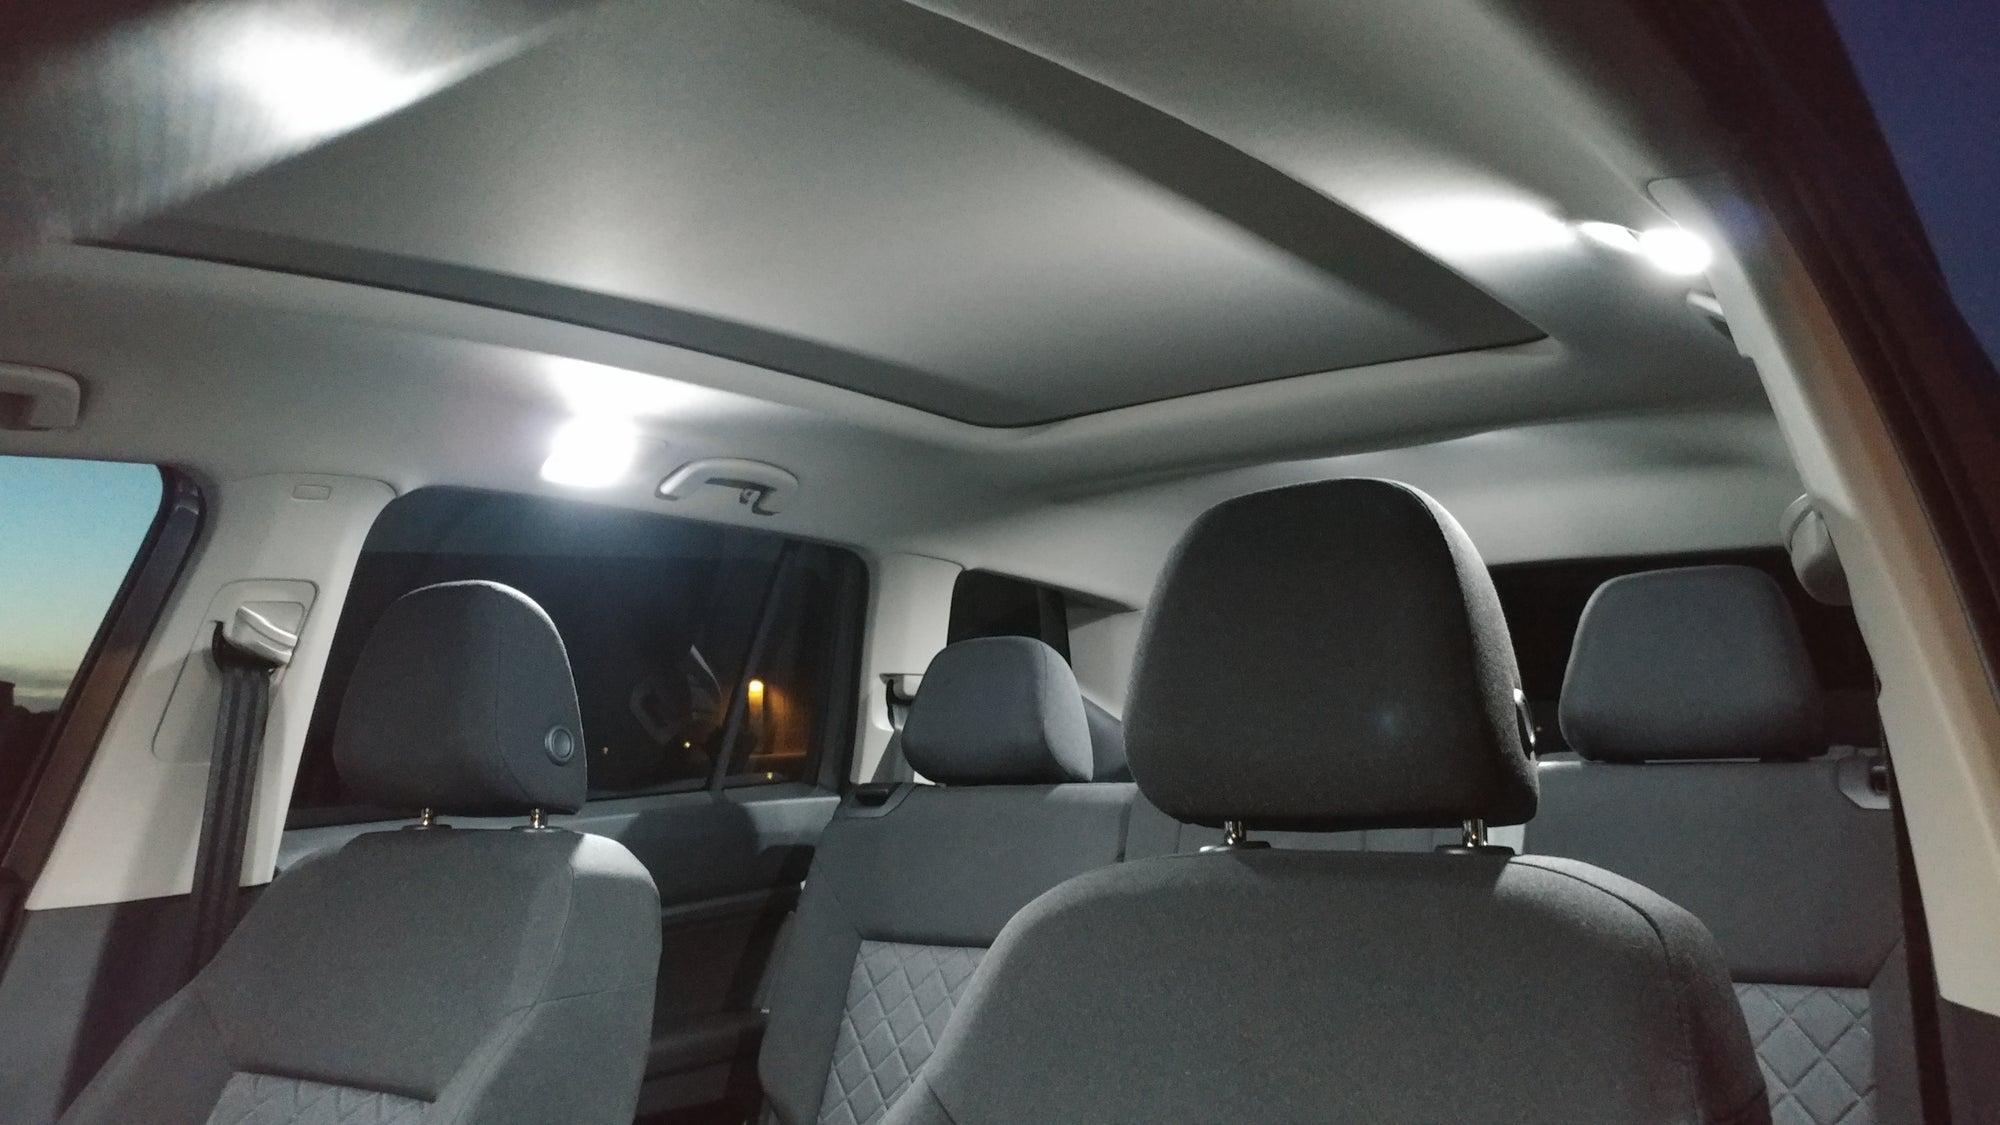 complete error free interior led kit fits volkswagen atlas deautokey. Black Bedroom Furniture Sets. Home Design Ideas